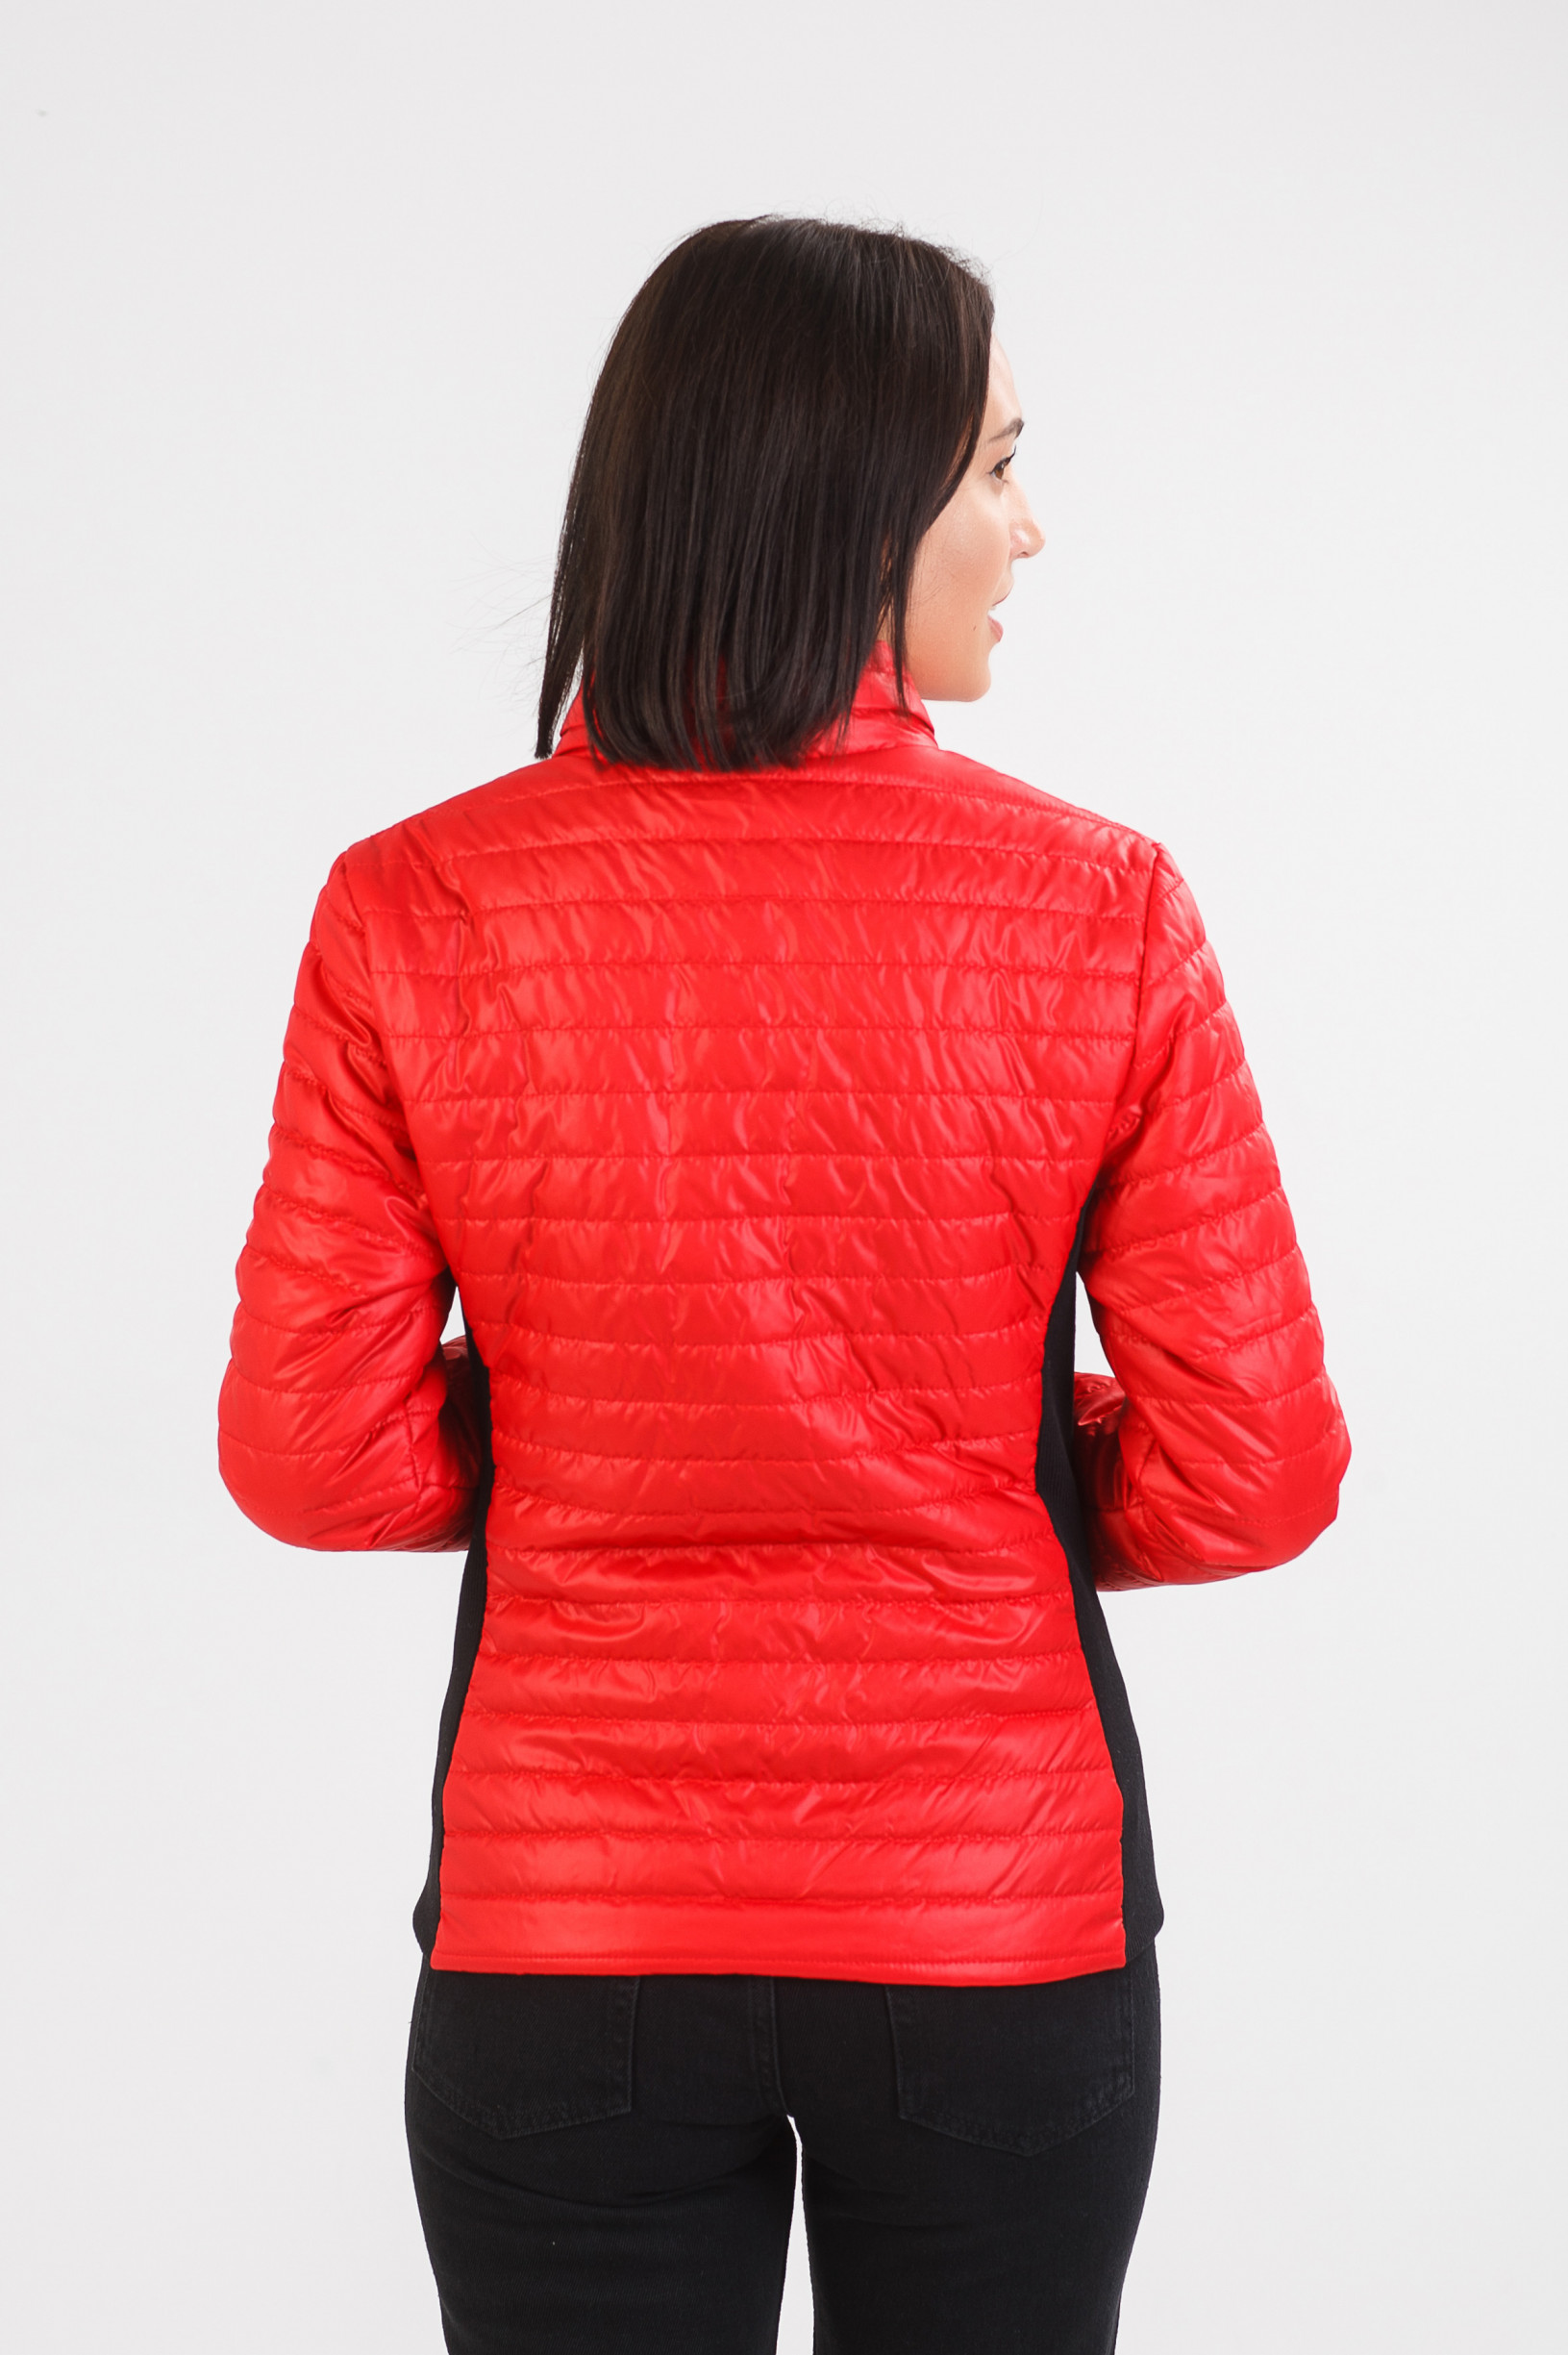 Красная тоненькая куртка Бетти